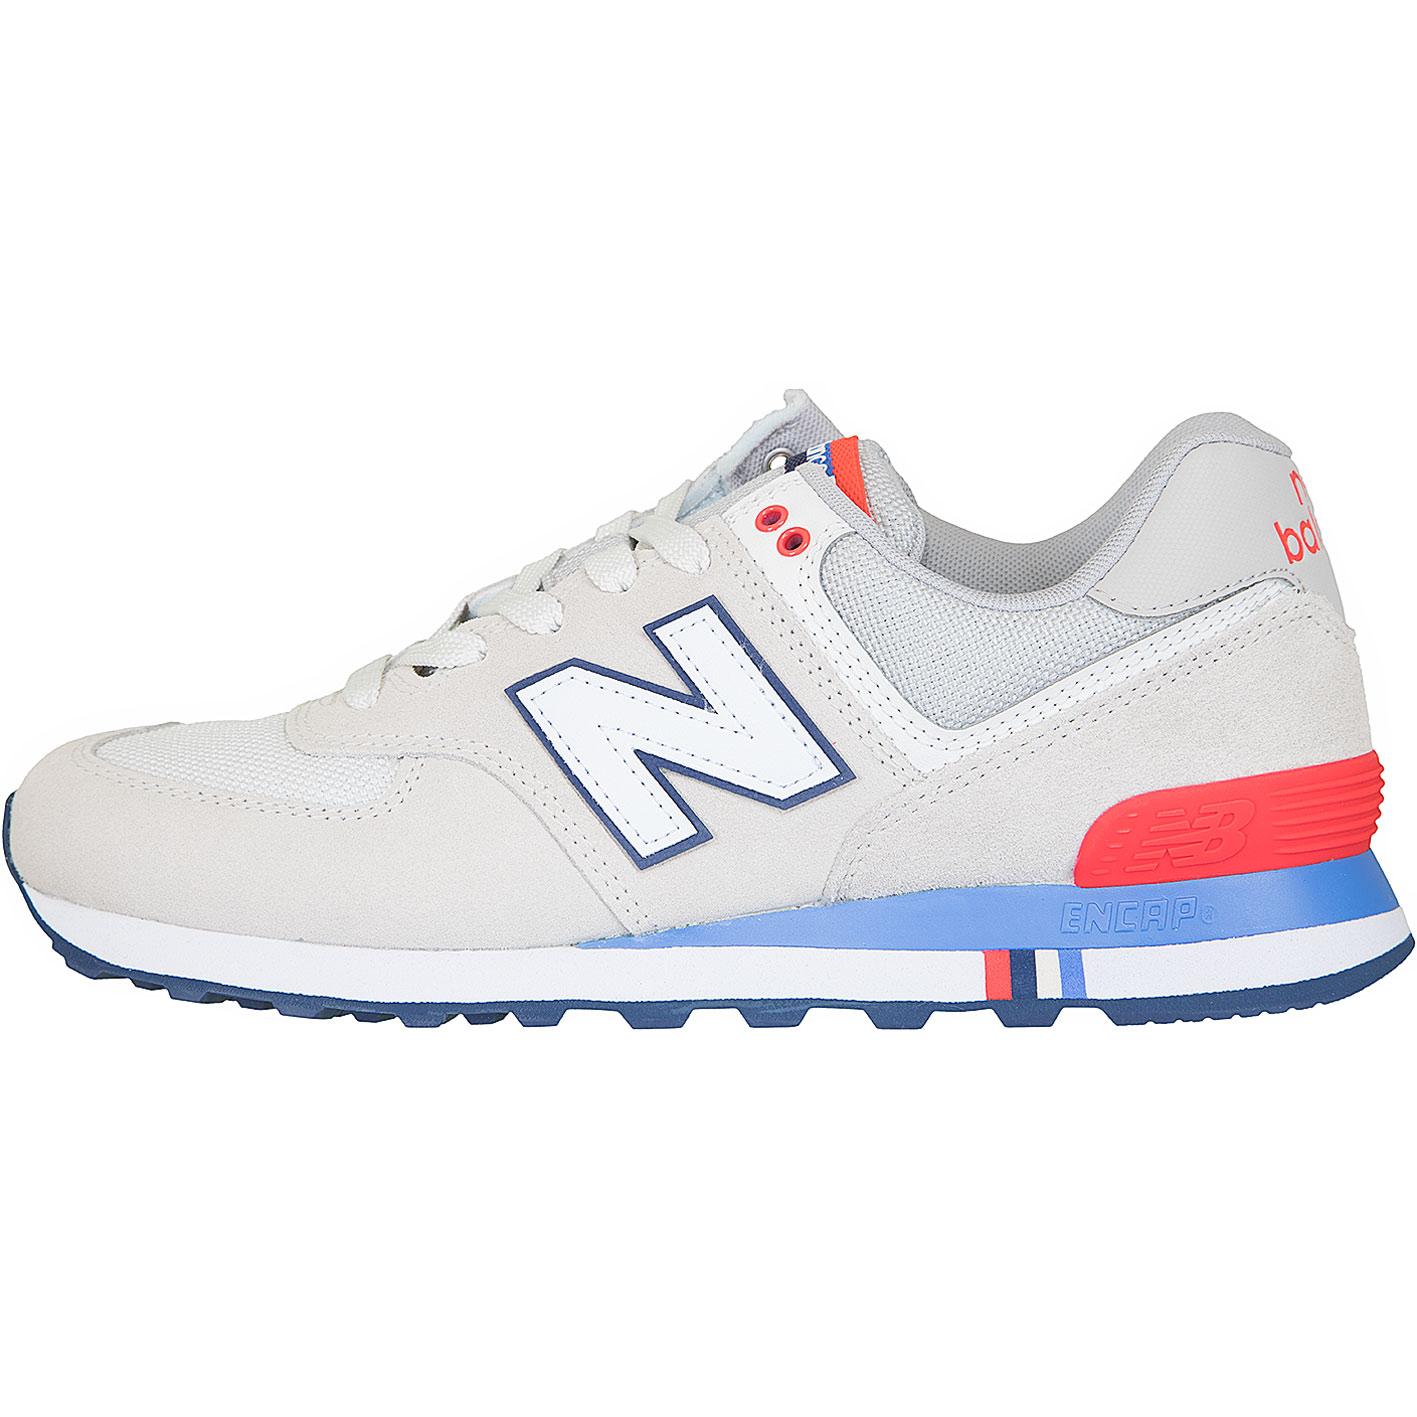 ☆ New Balance Sneaker 574 Leder/Textil beige/blau/rot ...